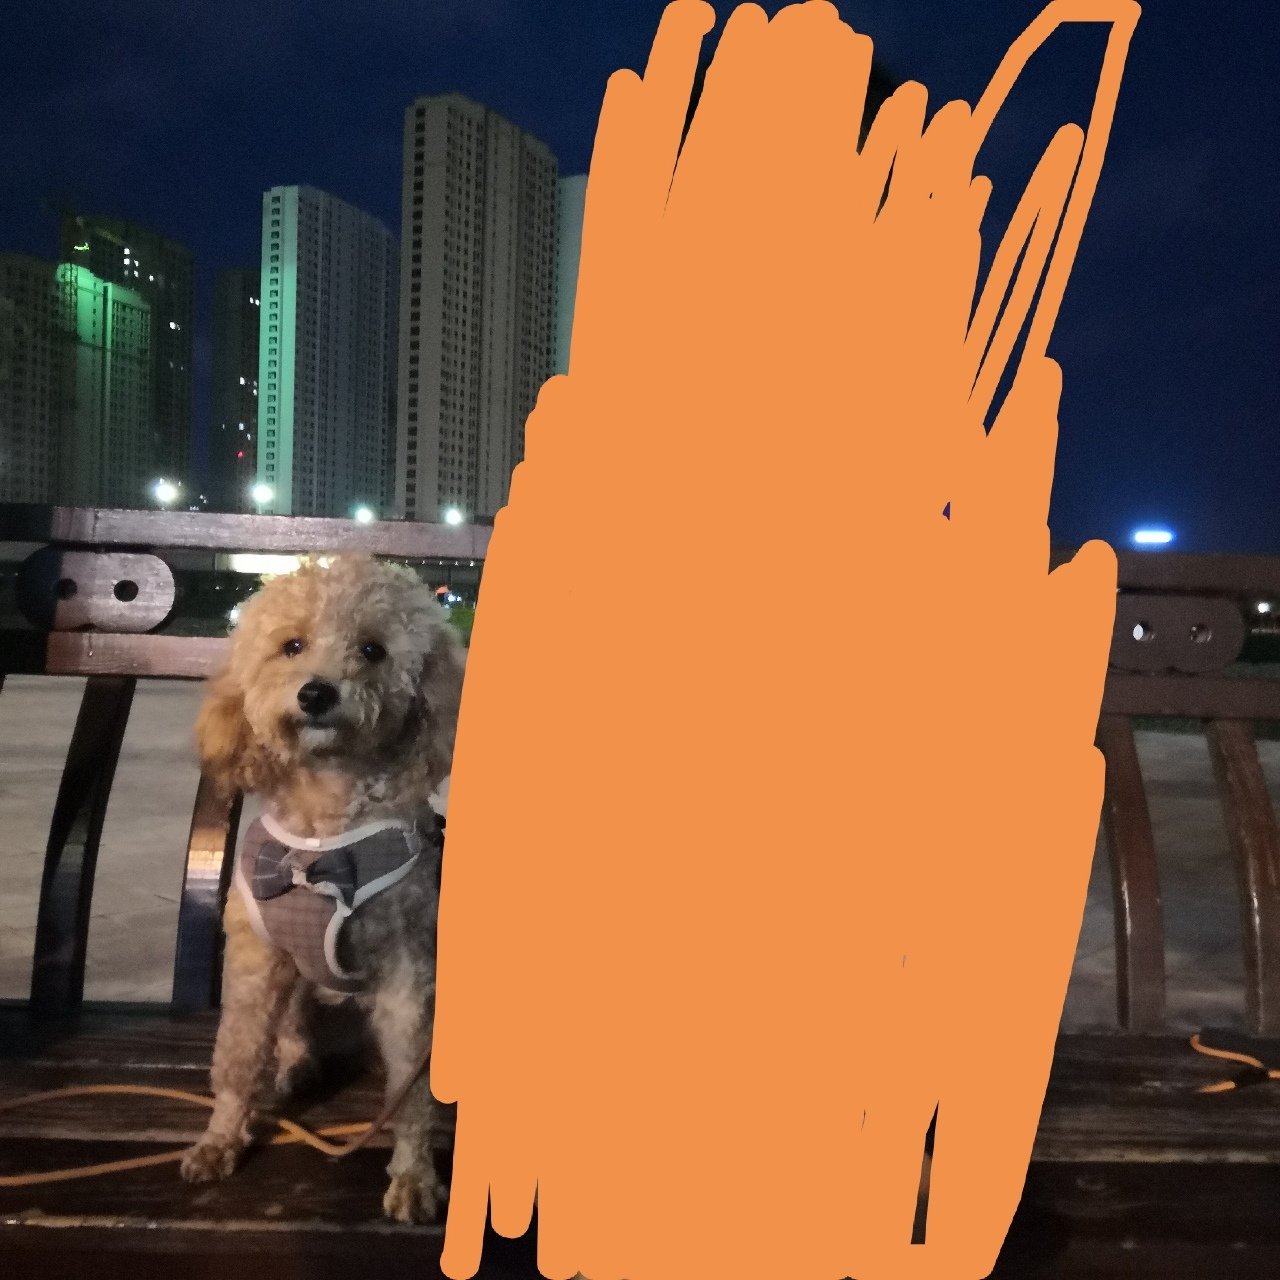 寻狗启示-棕色泰迪